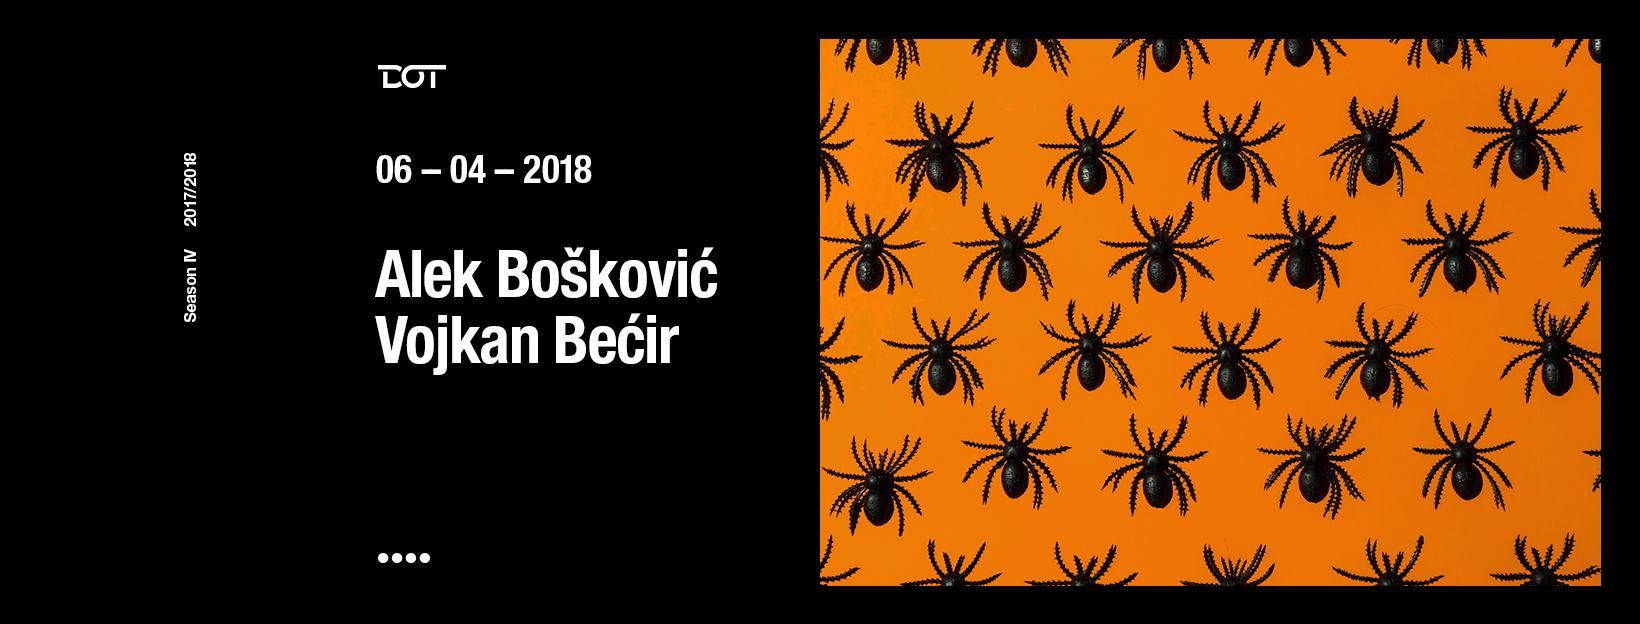 NUDGE, Alek Bošković, Vojkan Bećir